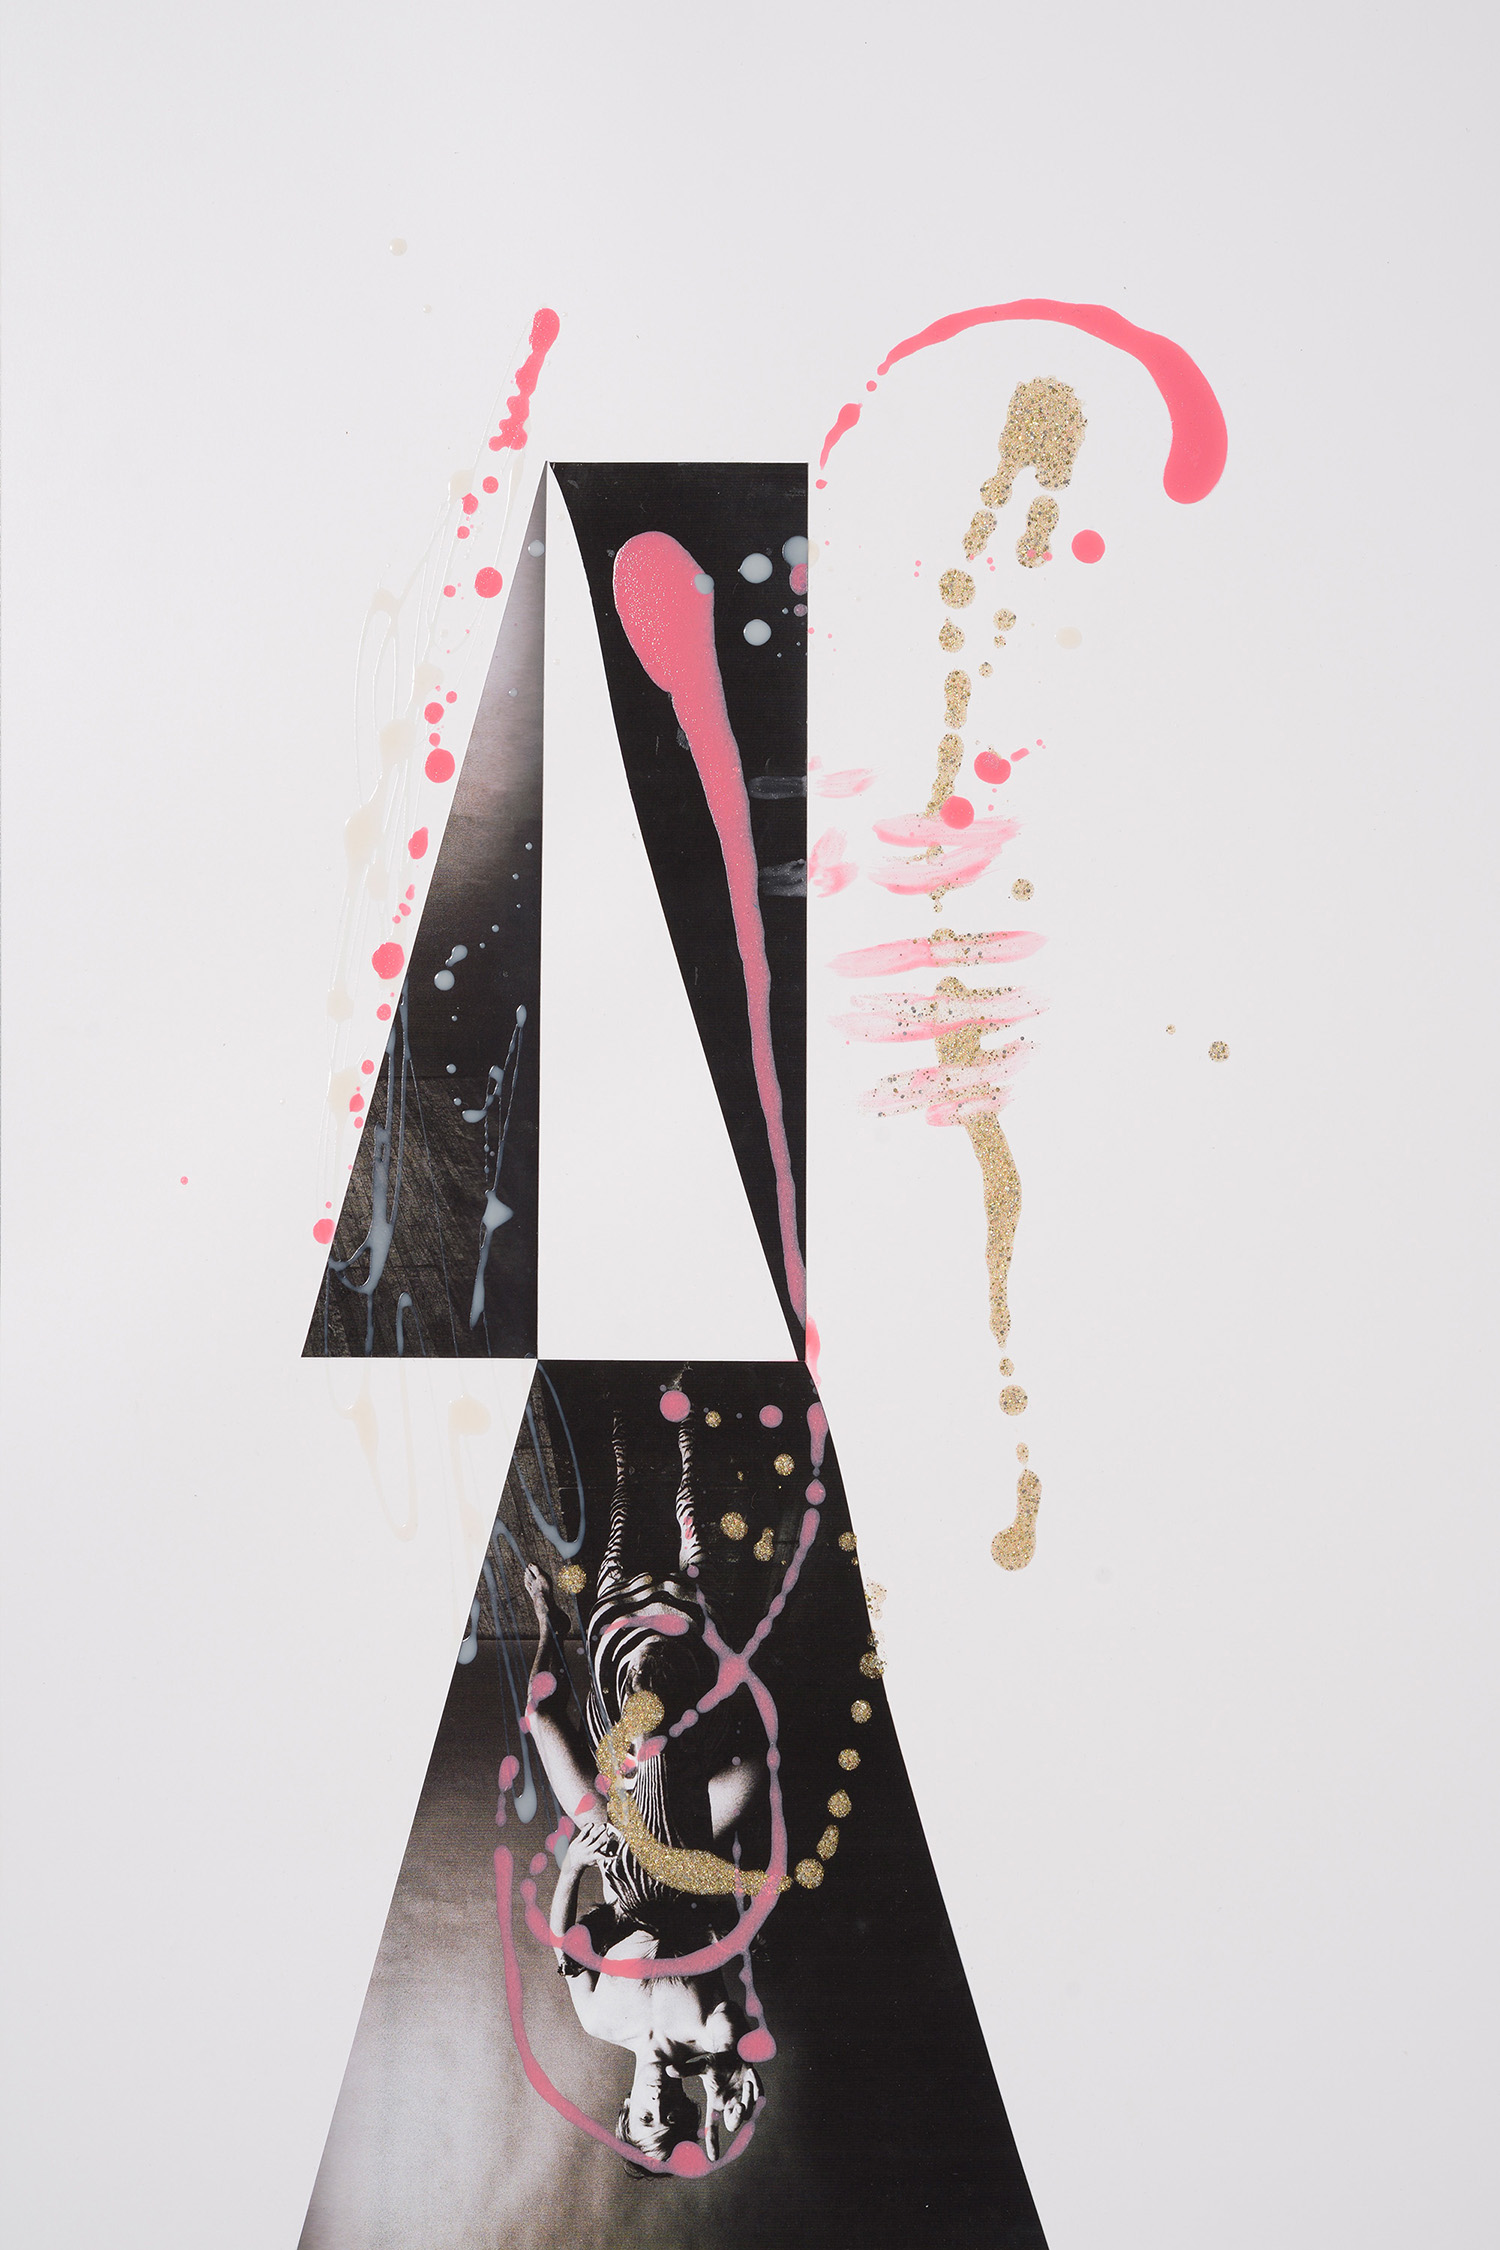 Markues, Eternal Optimist, 2014, mixed media on paper, 60 x 40 cm.jpg